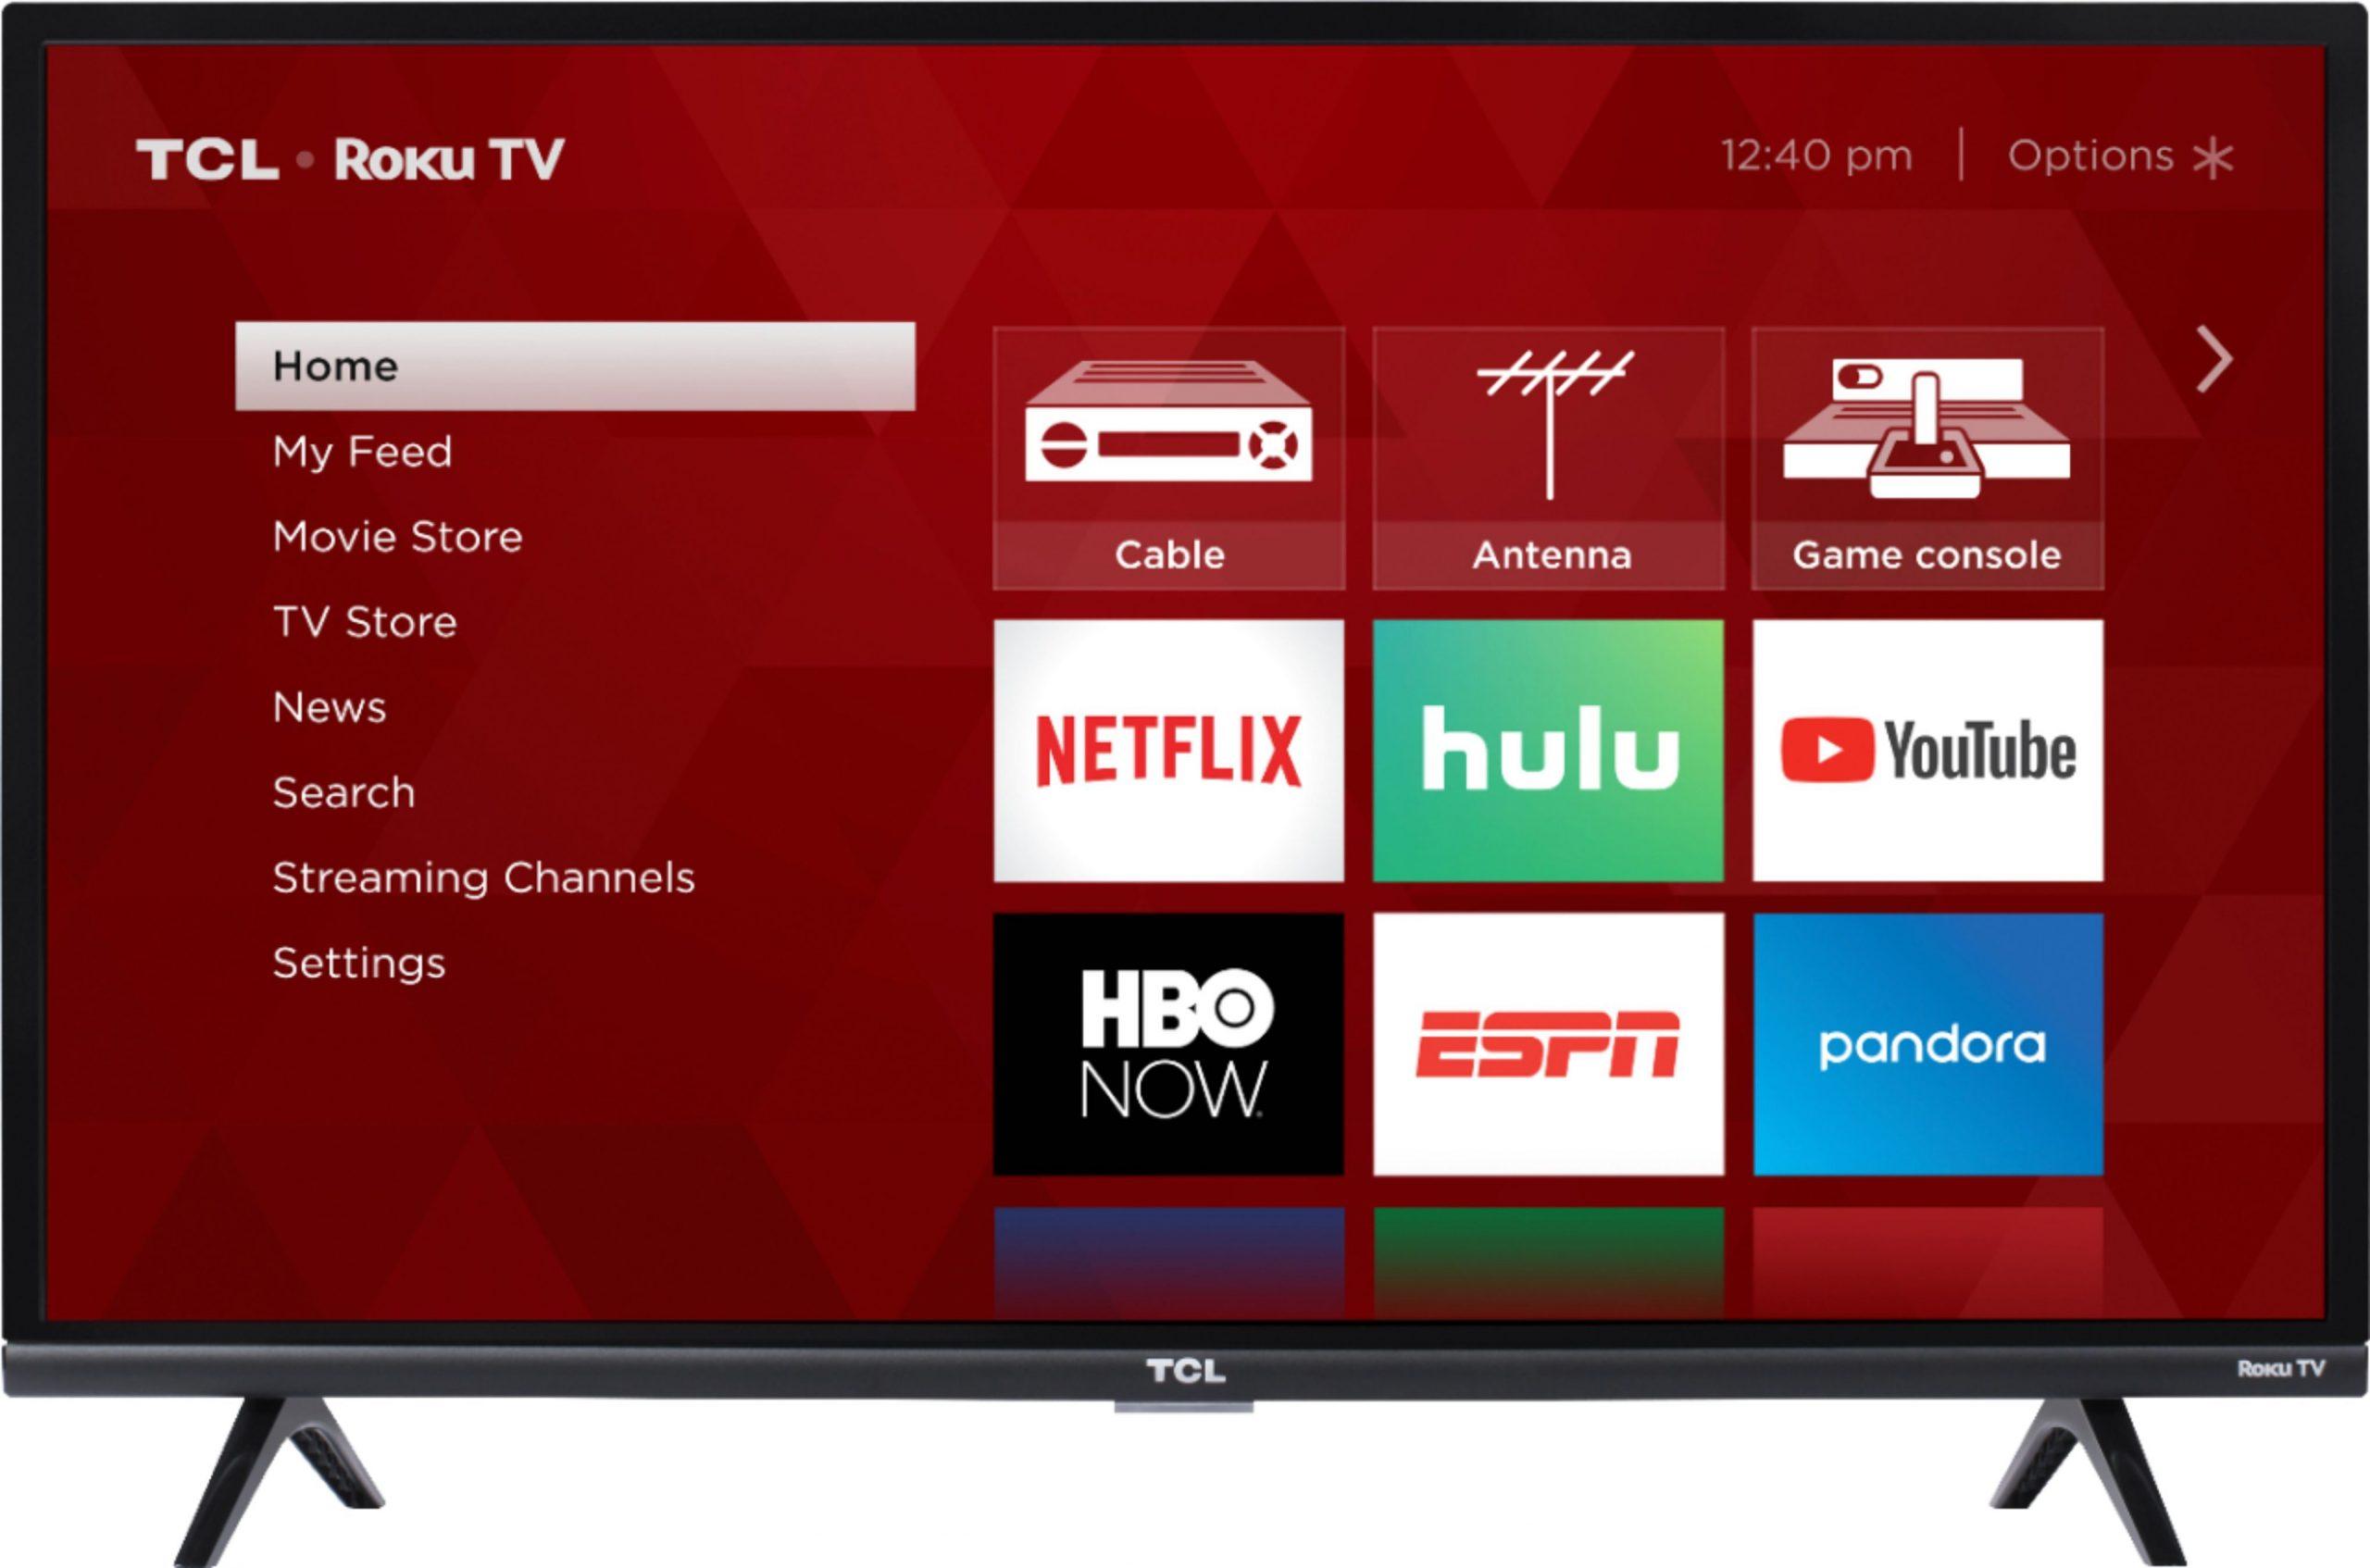 Roku TCL TV operating system